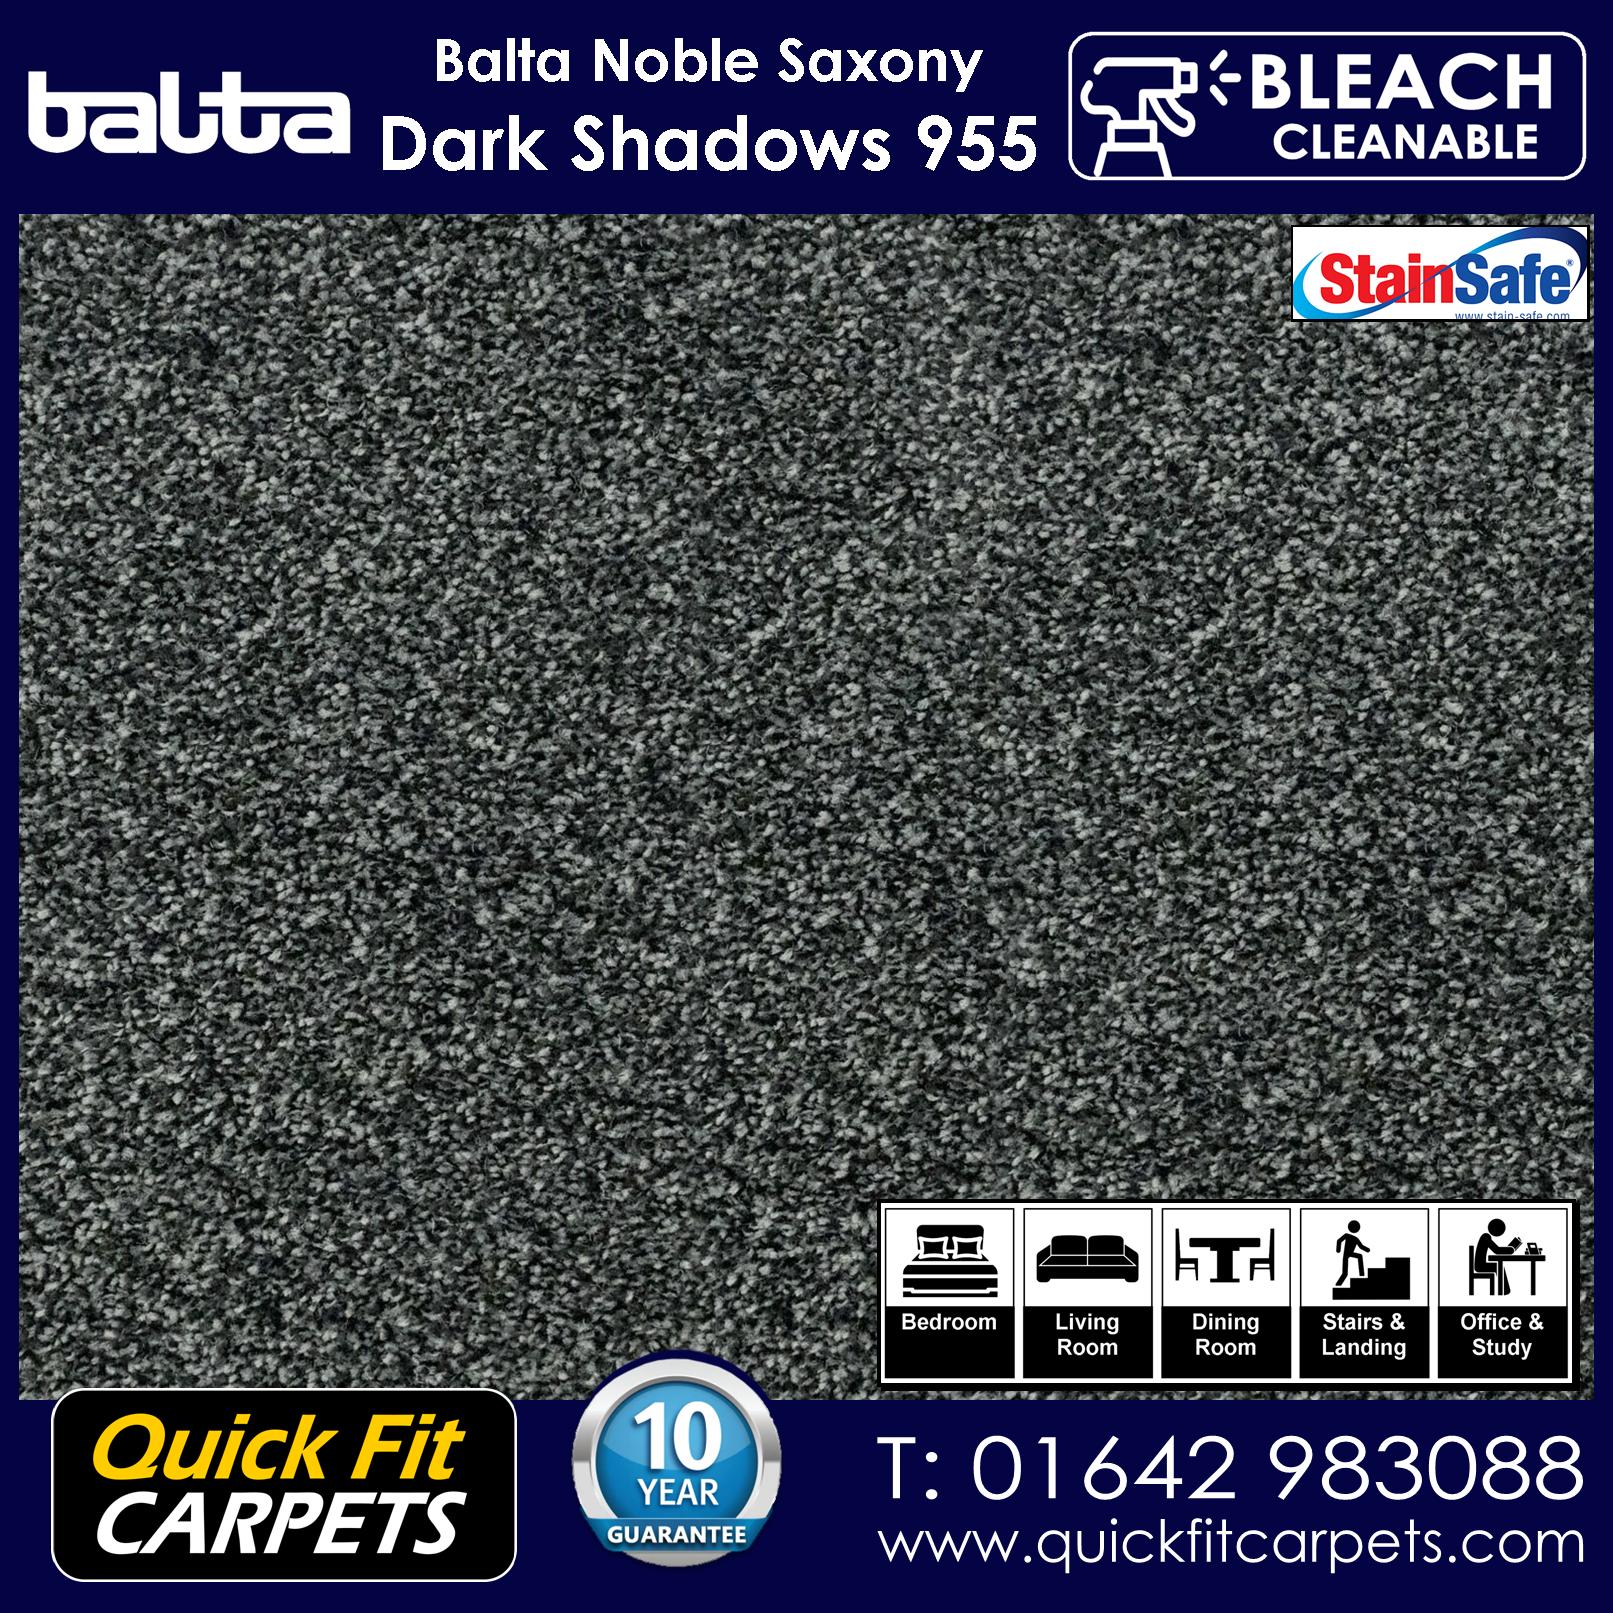 Quick Fit Carpets Balta Luxury Pile Dark Shadows 955